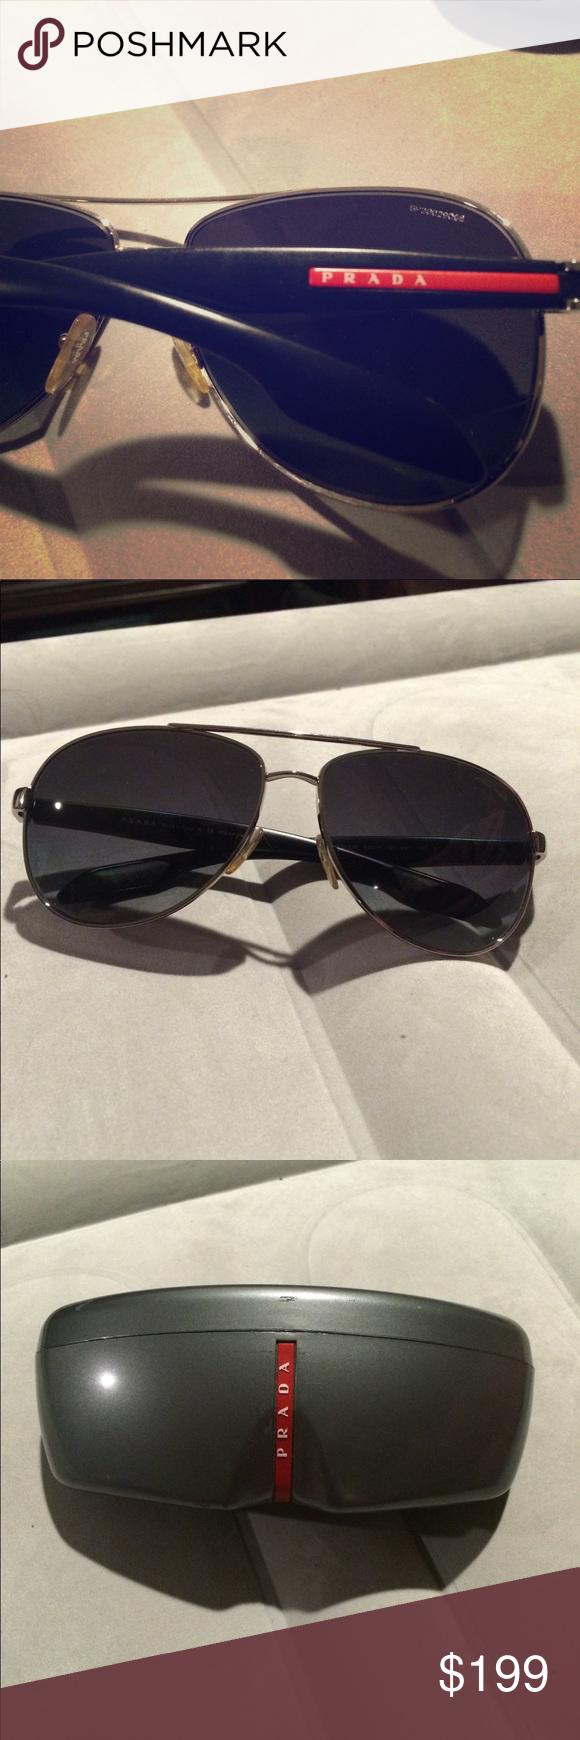 e5fa4dbf1a06 Like New men s aviator Prada sunglasses Like New men s aviator Prada  sunglasses. Comes with the case. No scratches. Prada Accessories Sunglasses